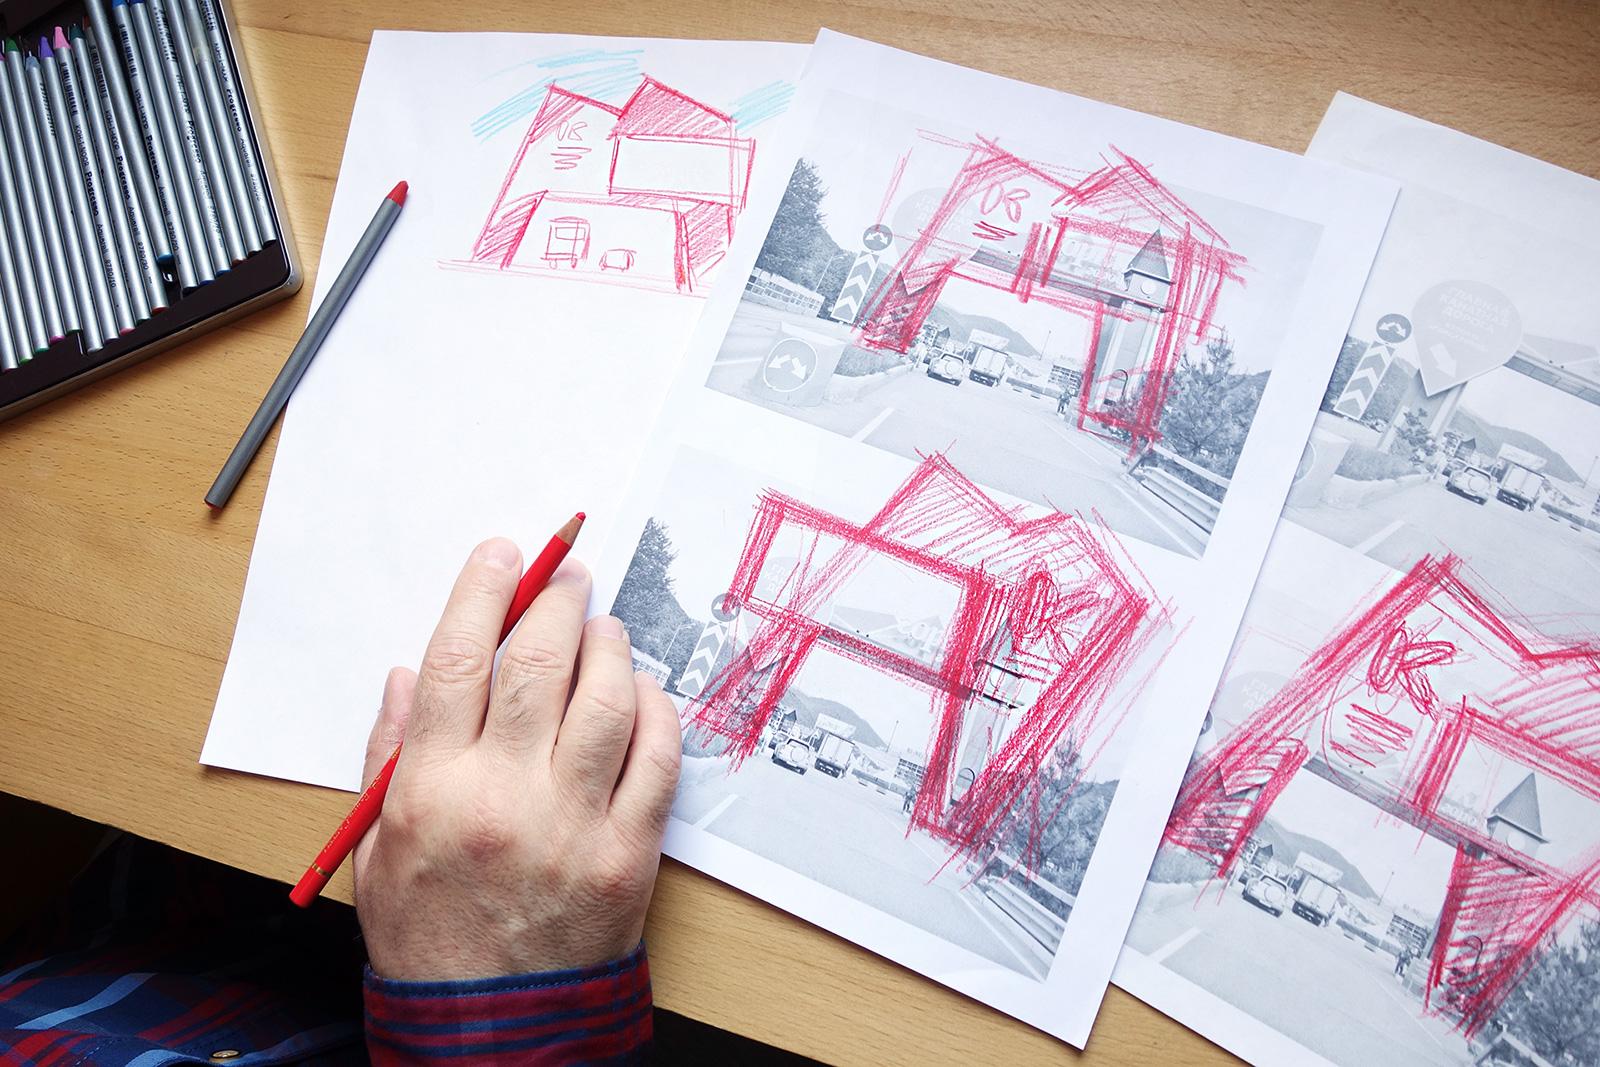 Асгард, Давид Авакян, эскиз, графический дизайн, Красная Поляна, арка